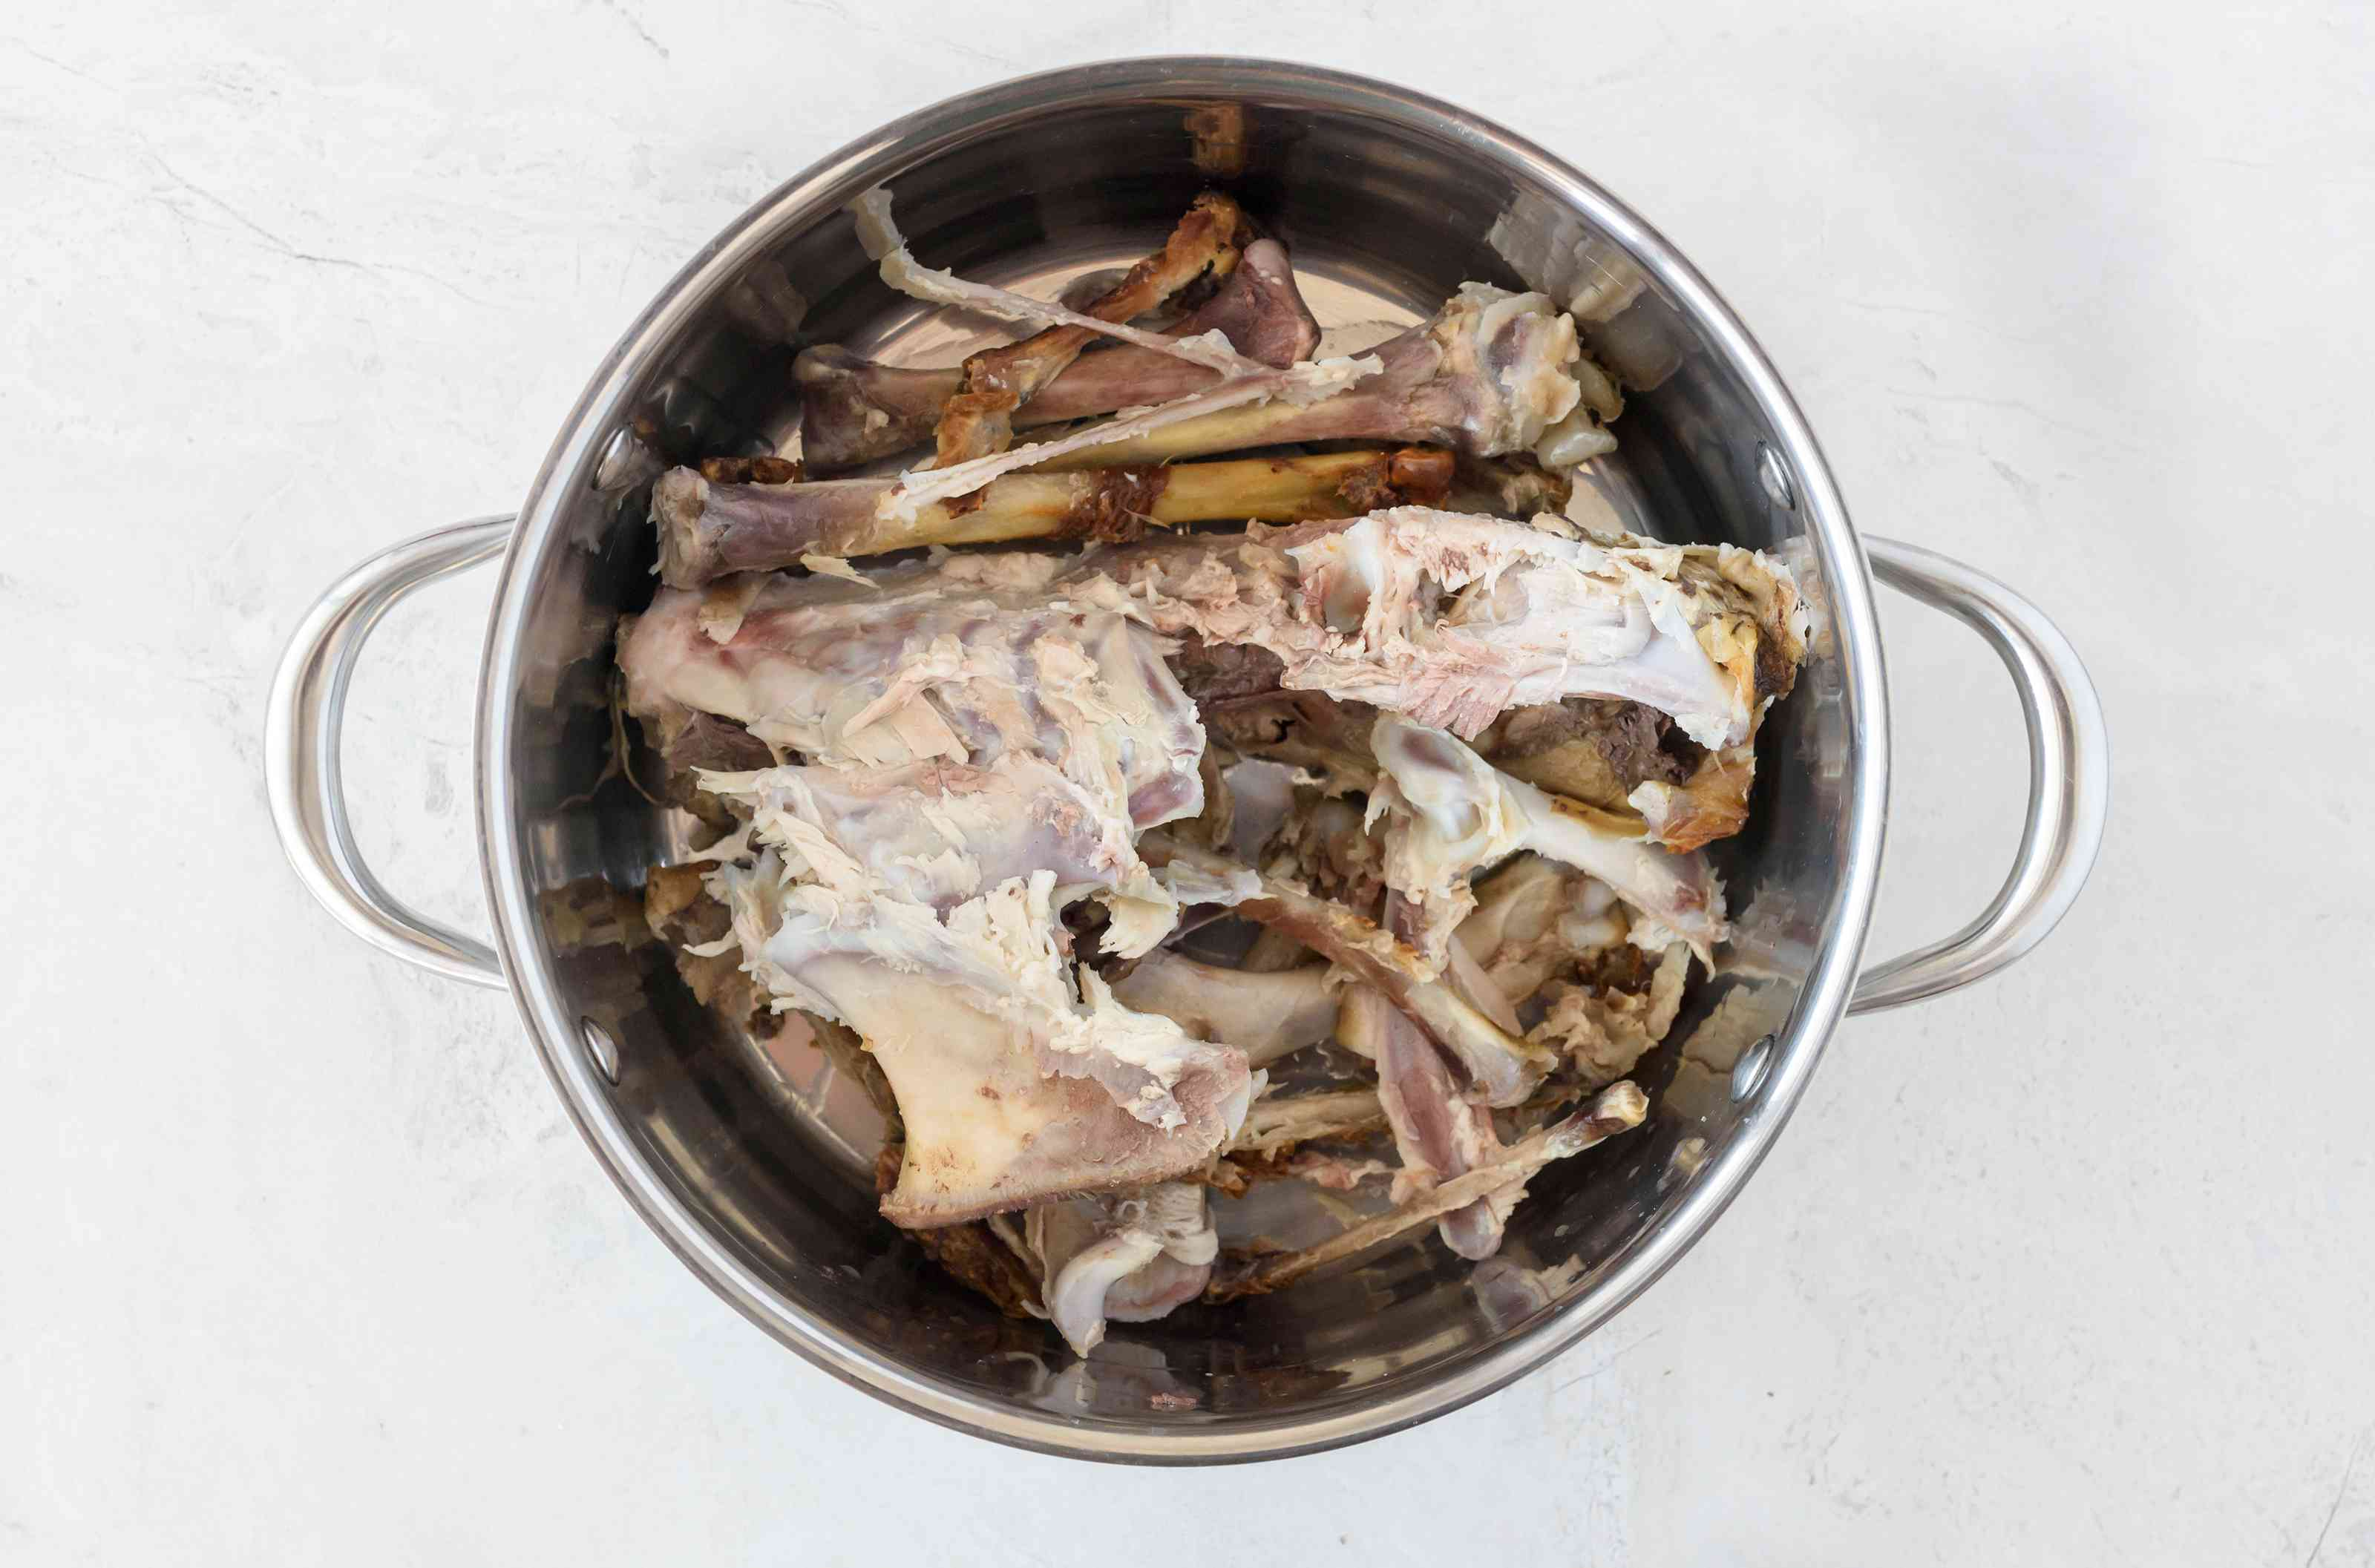 Rinse turkey bones